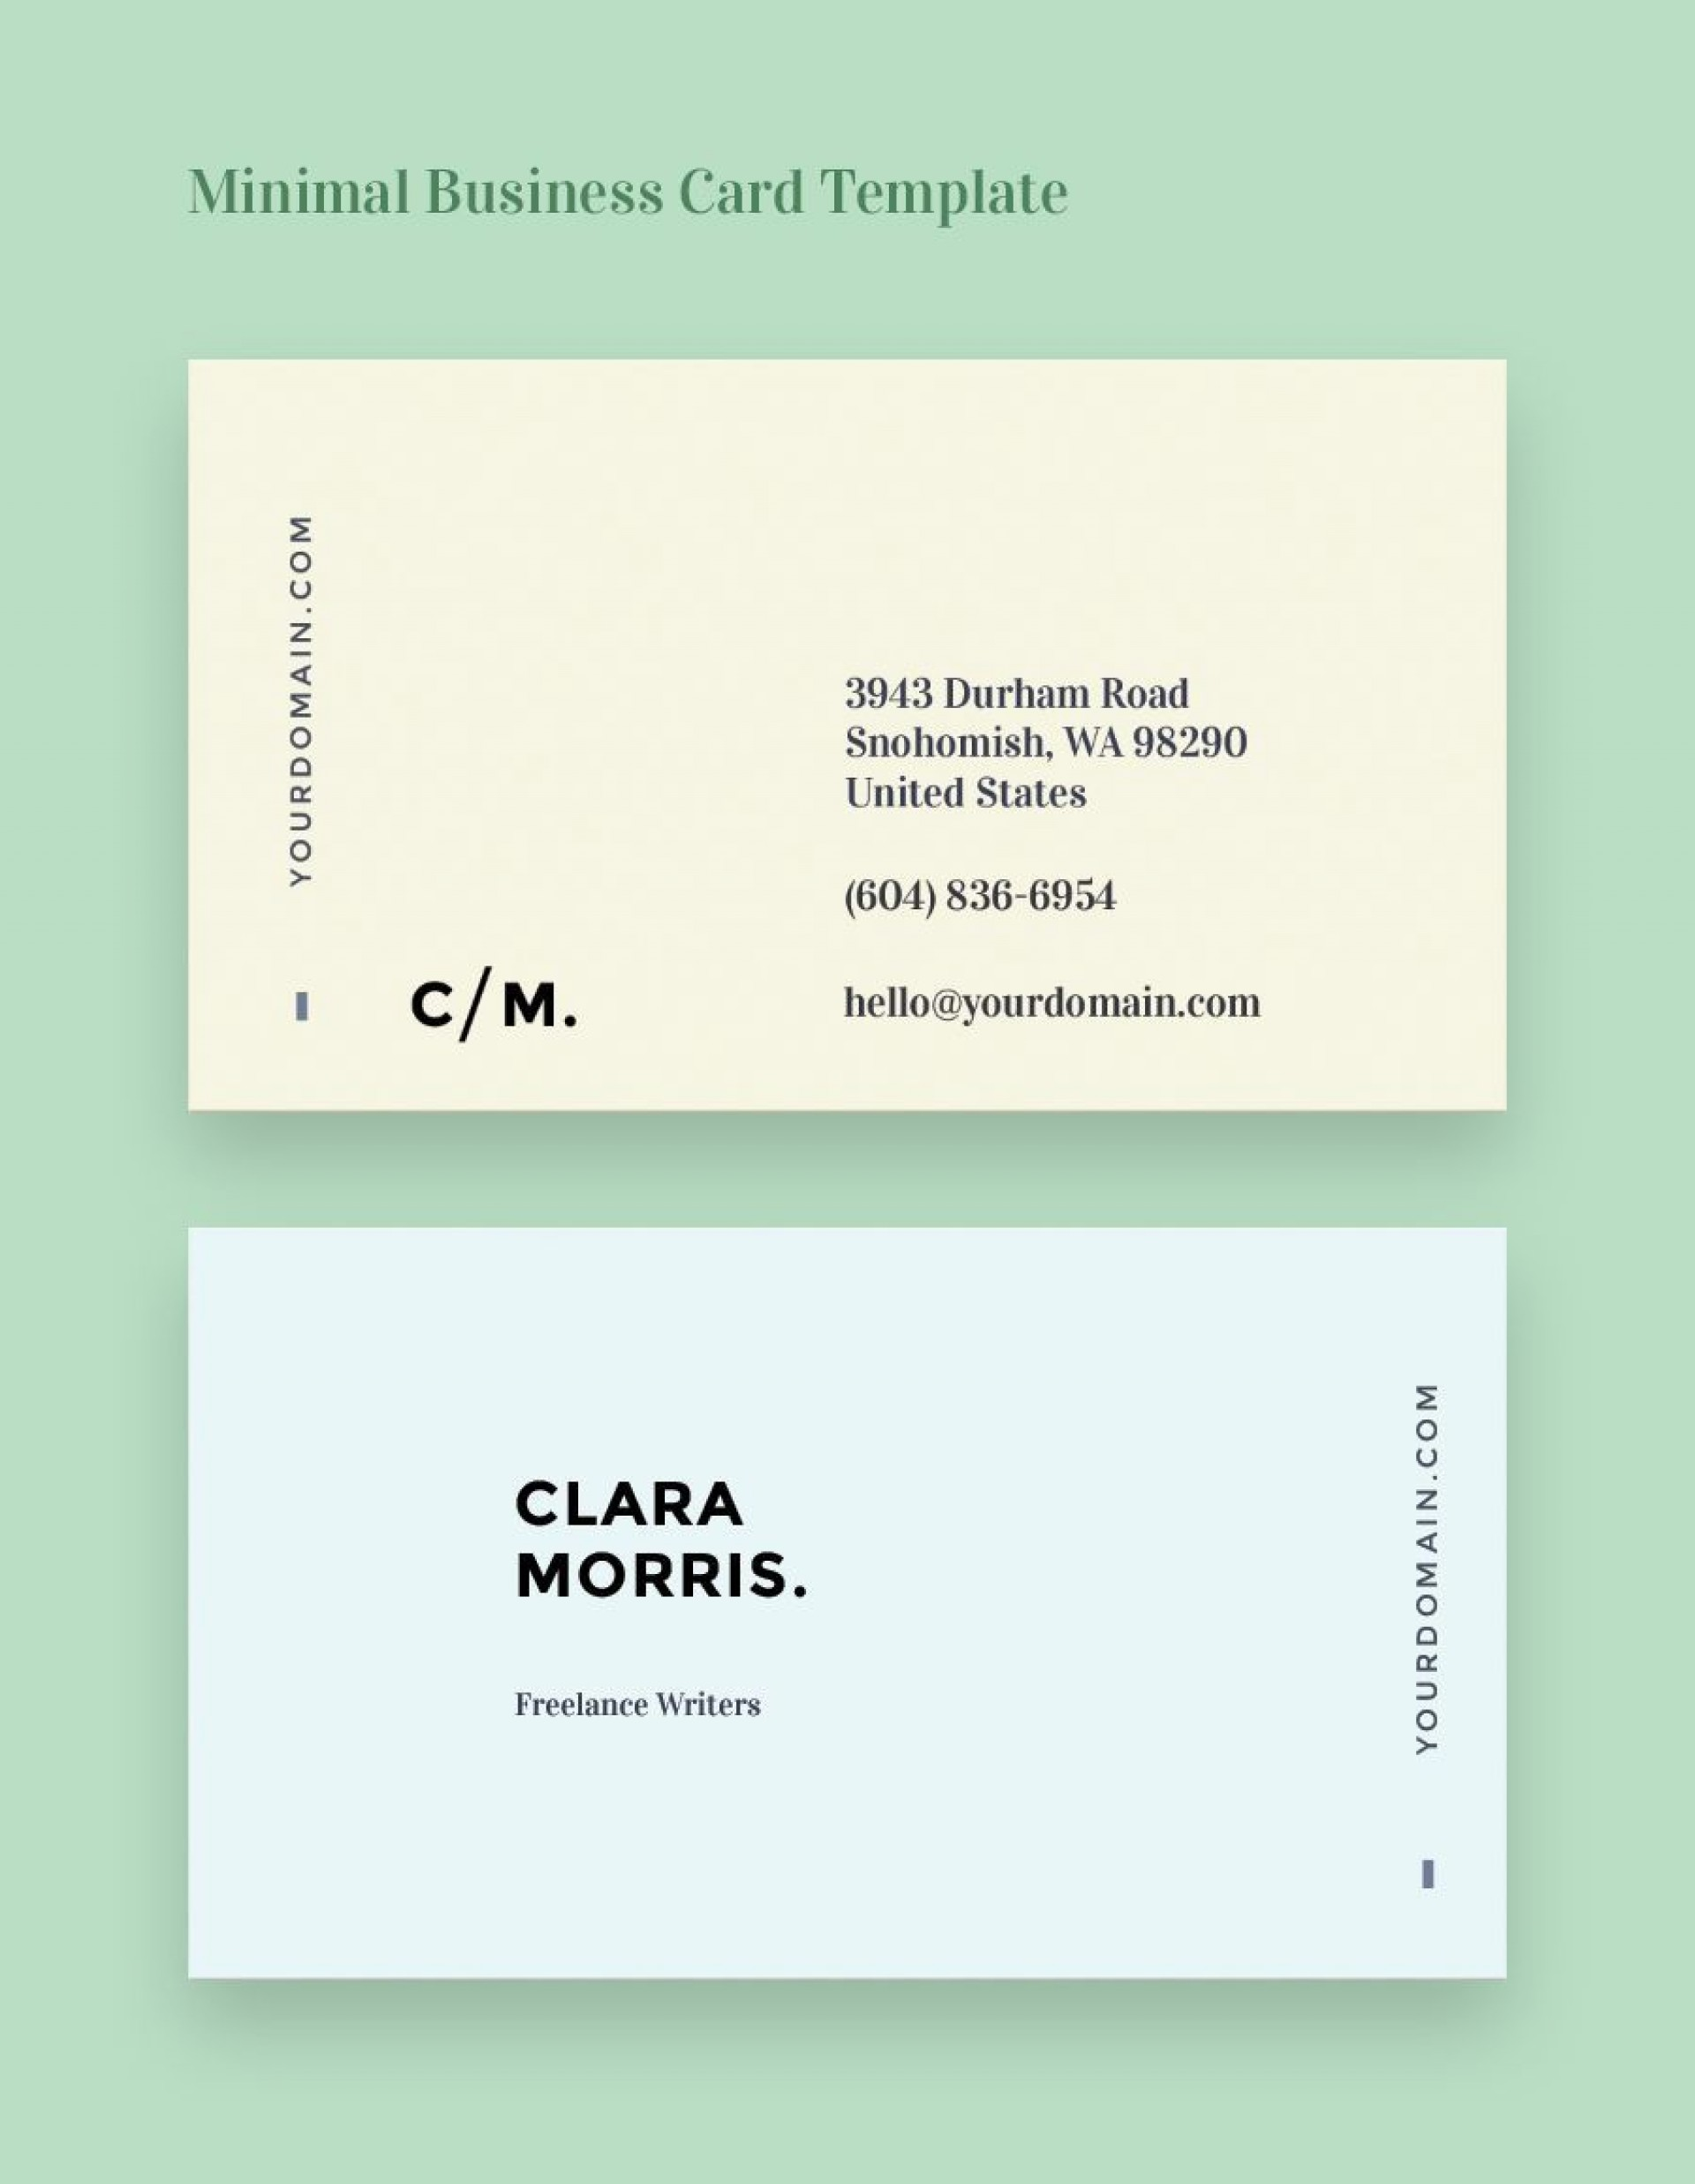 002 Shocking Minimalist Busines Card Template Free High Resolution  Minimal Psd1920